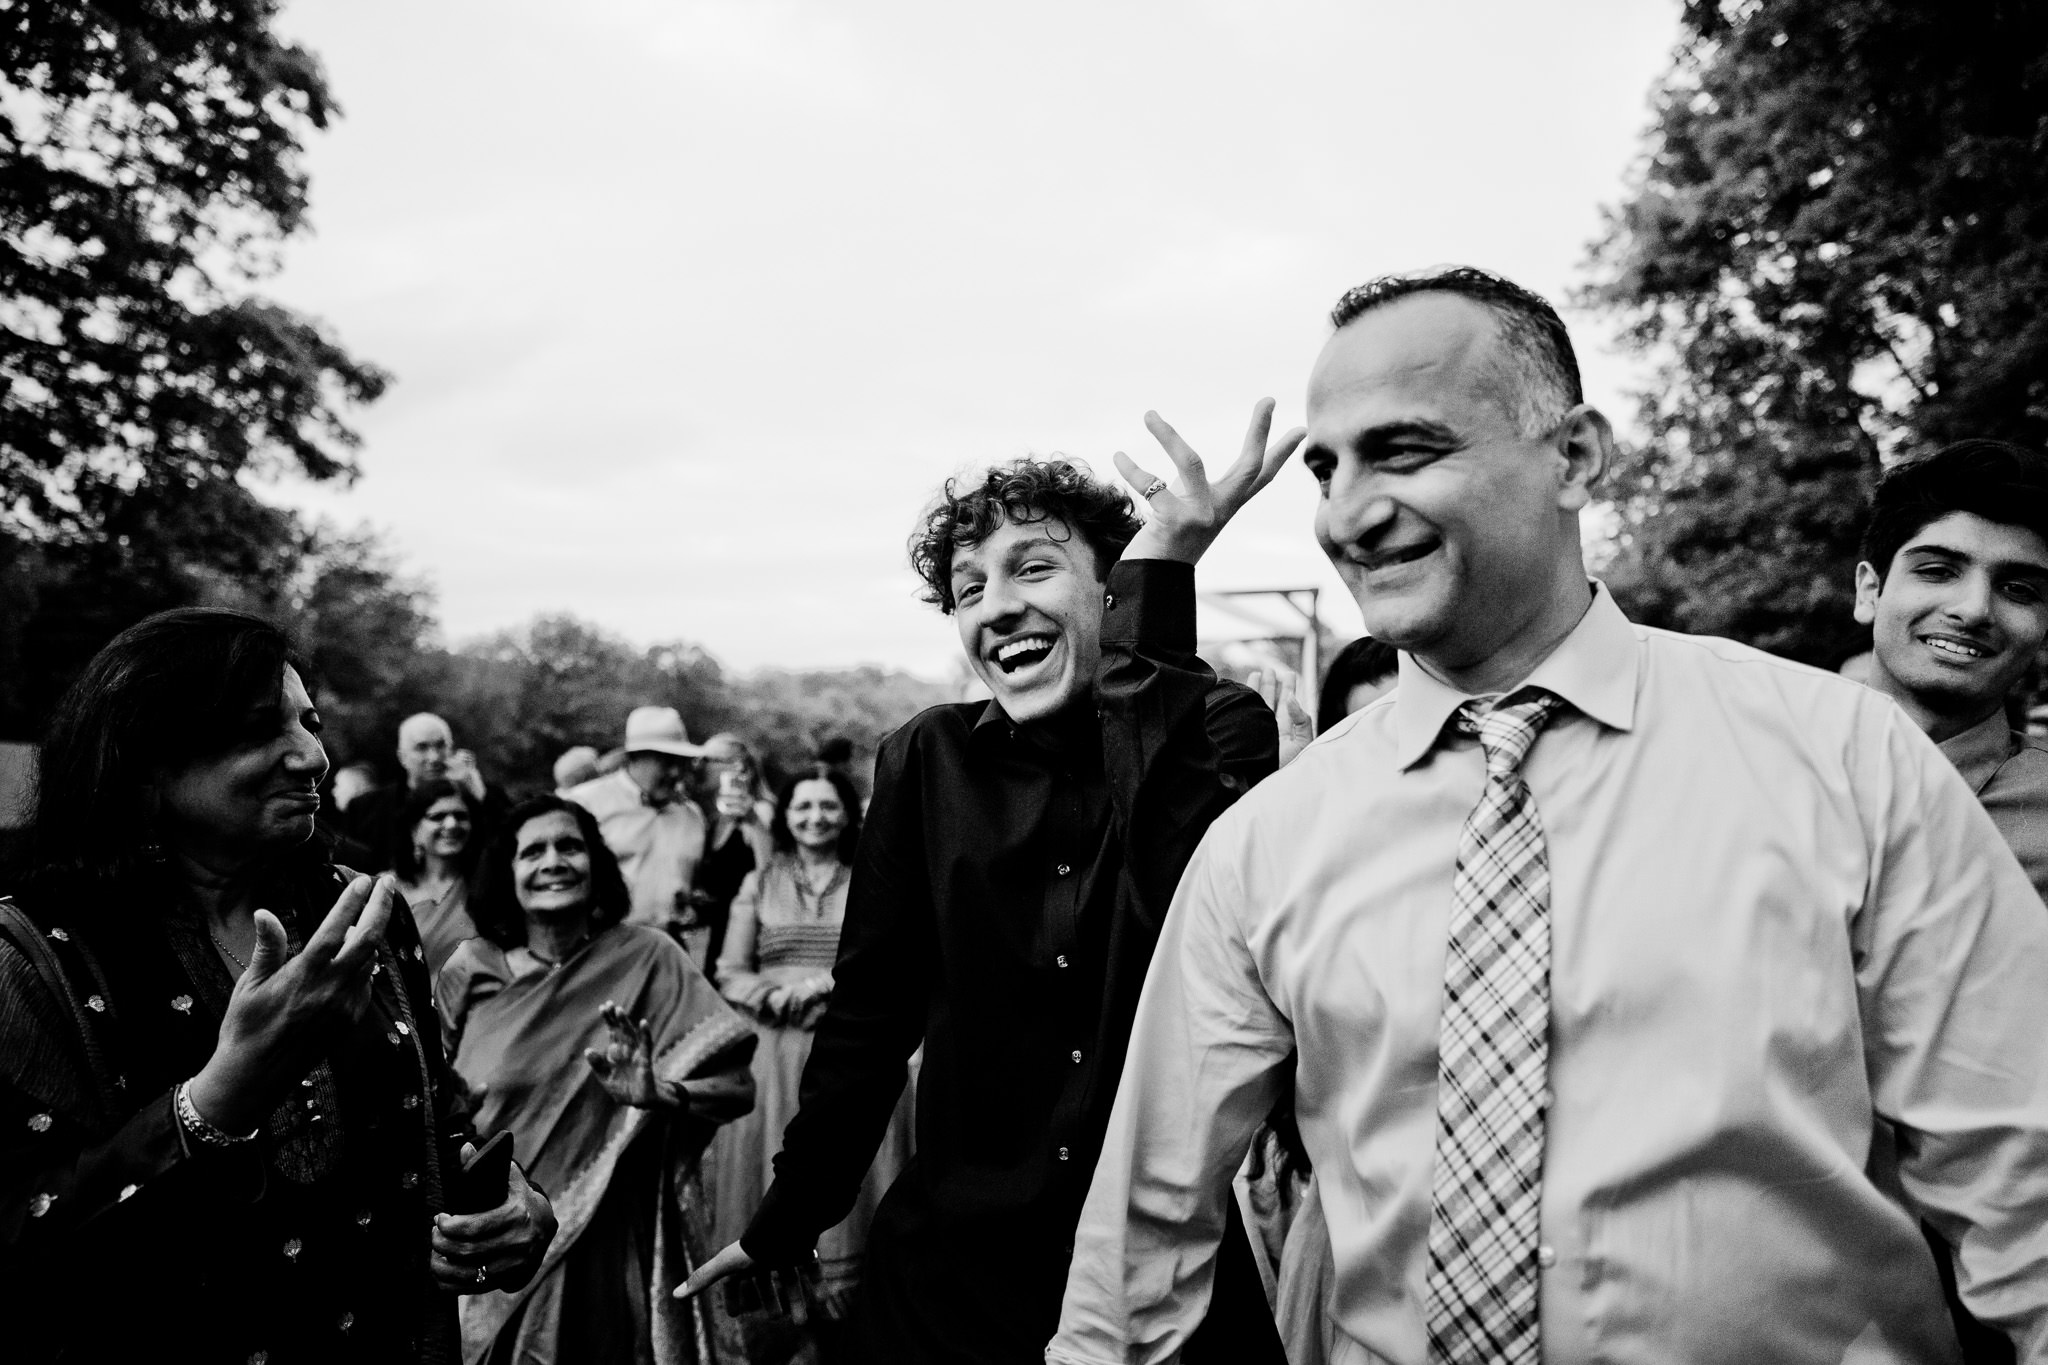 049_Canada-documentary-wedding-photograp